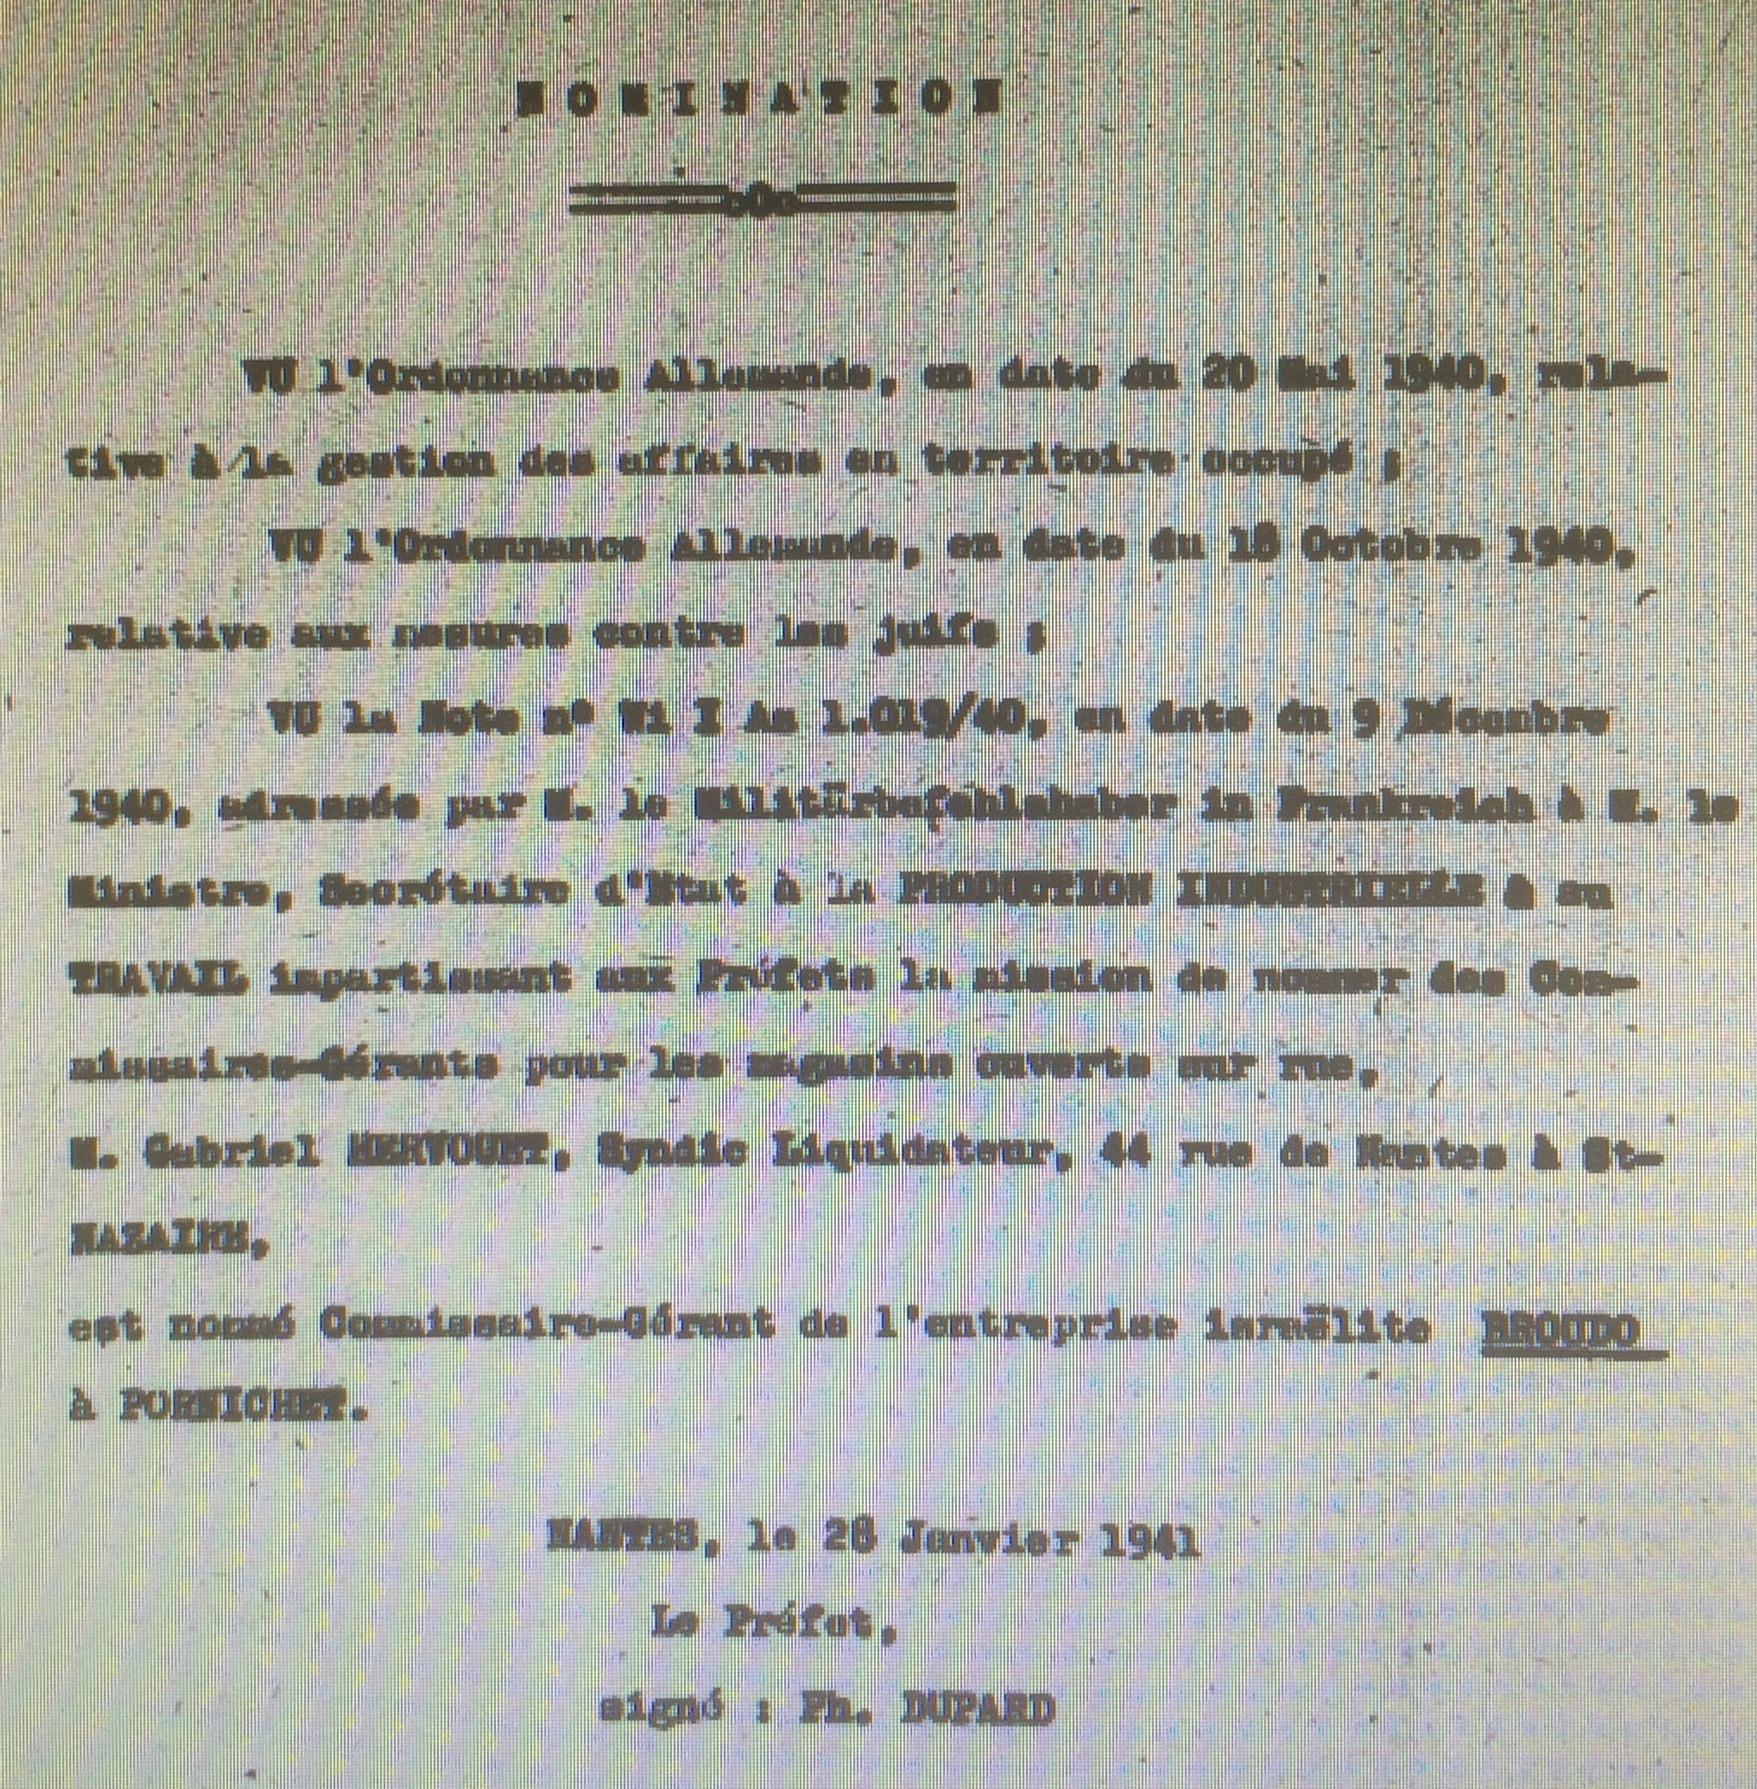 Dossier d'aryanisation Salomon BROUDO [AN AJ38/4598 dossier n°2529]